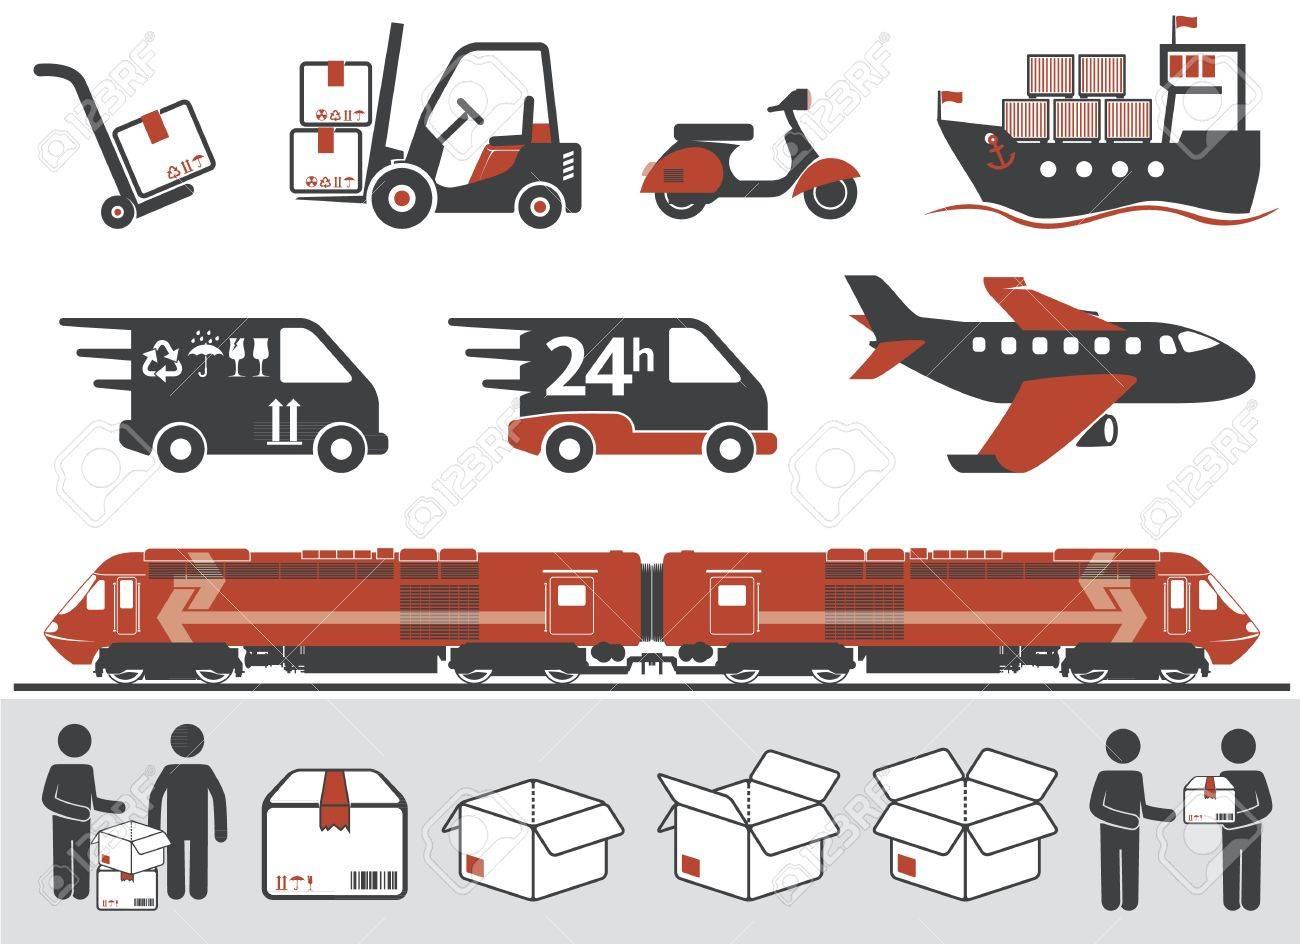 Mail delivery, transportation symbols, boxes - 13295513